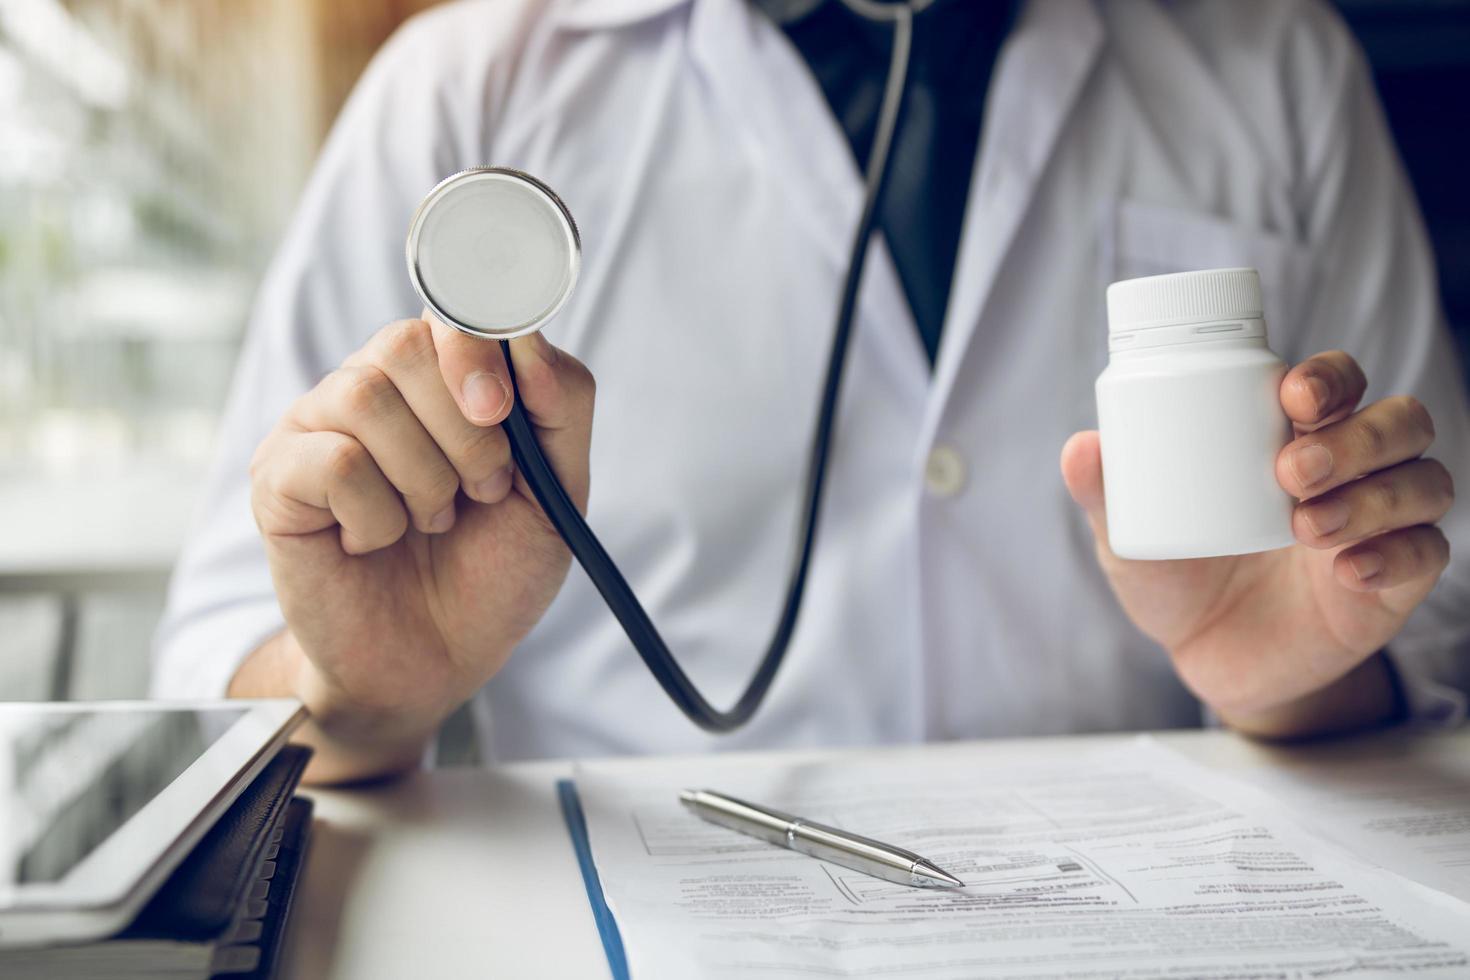 Doctor holding stethoscope and medicine bottle photo